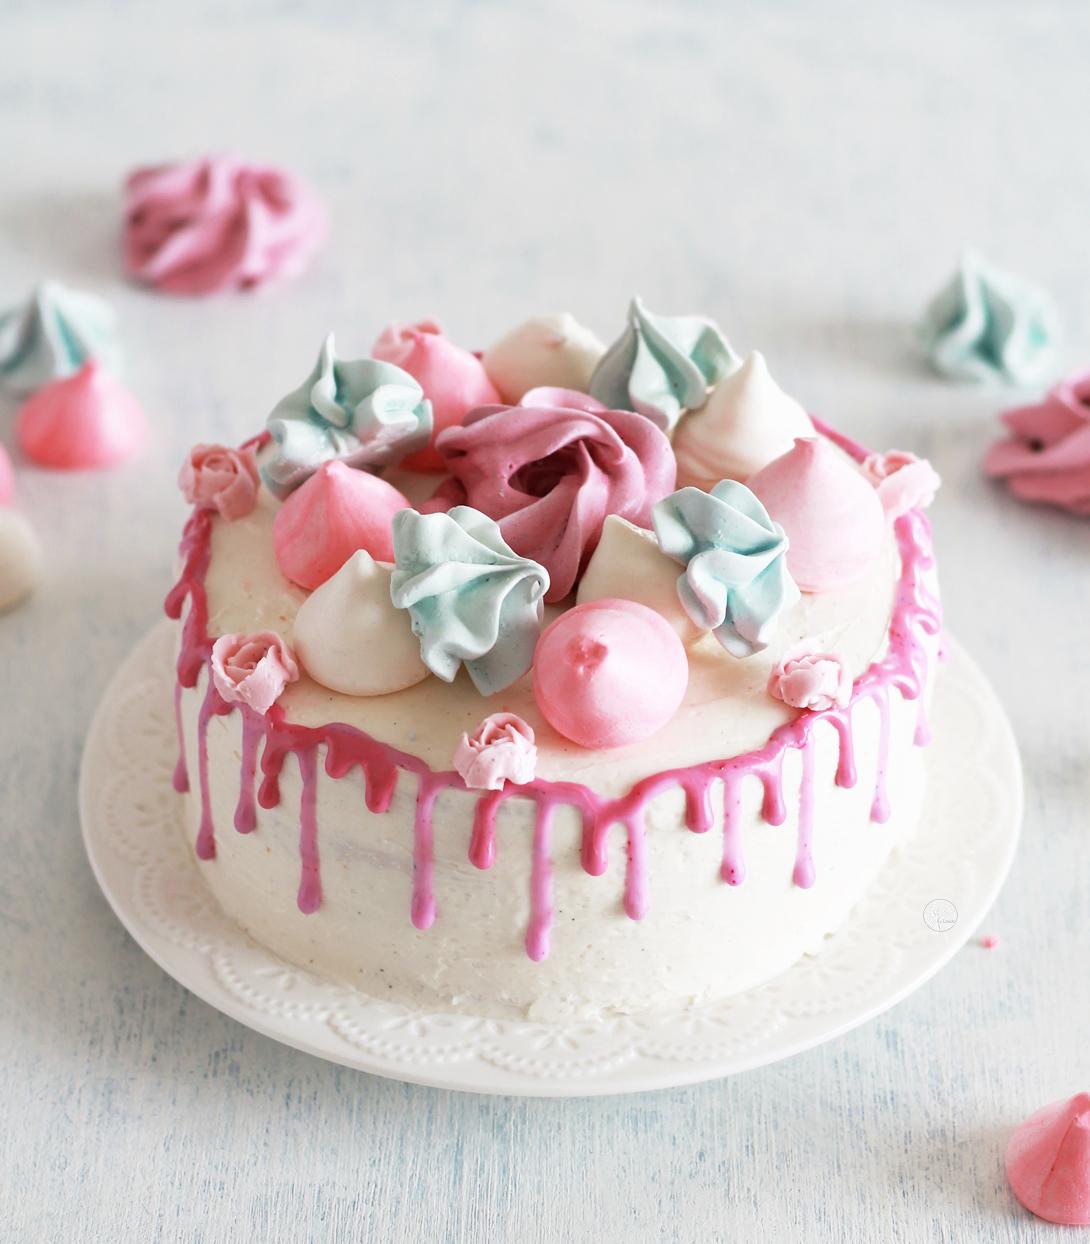 Sponge cake senza glutine con crema al burro meringata - La Cassata Celiaca